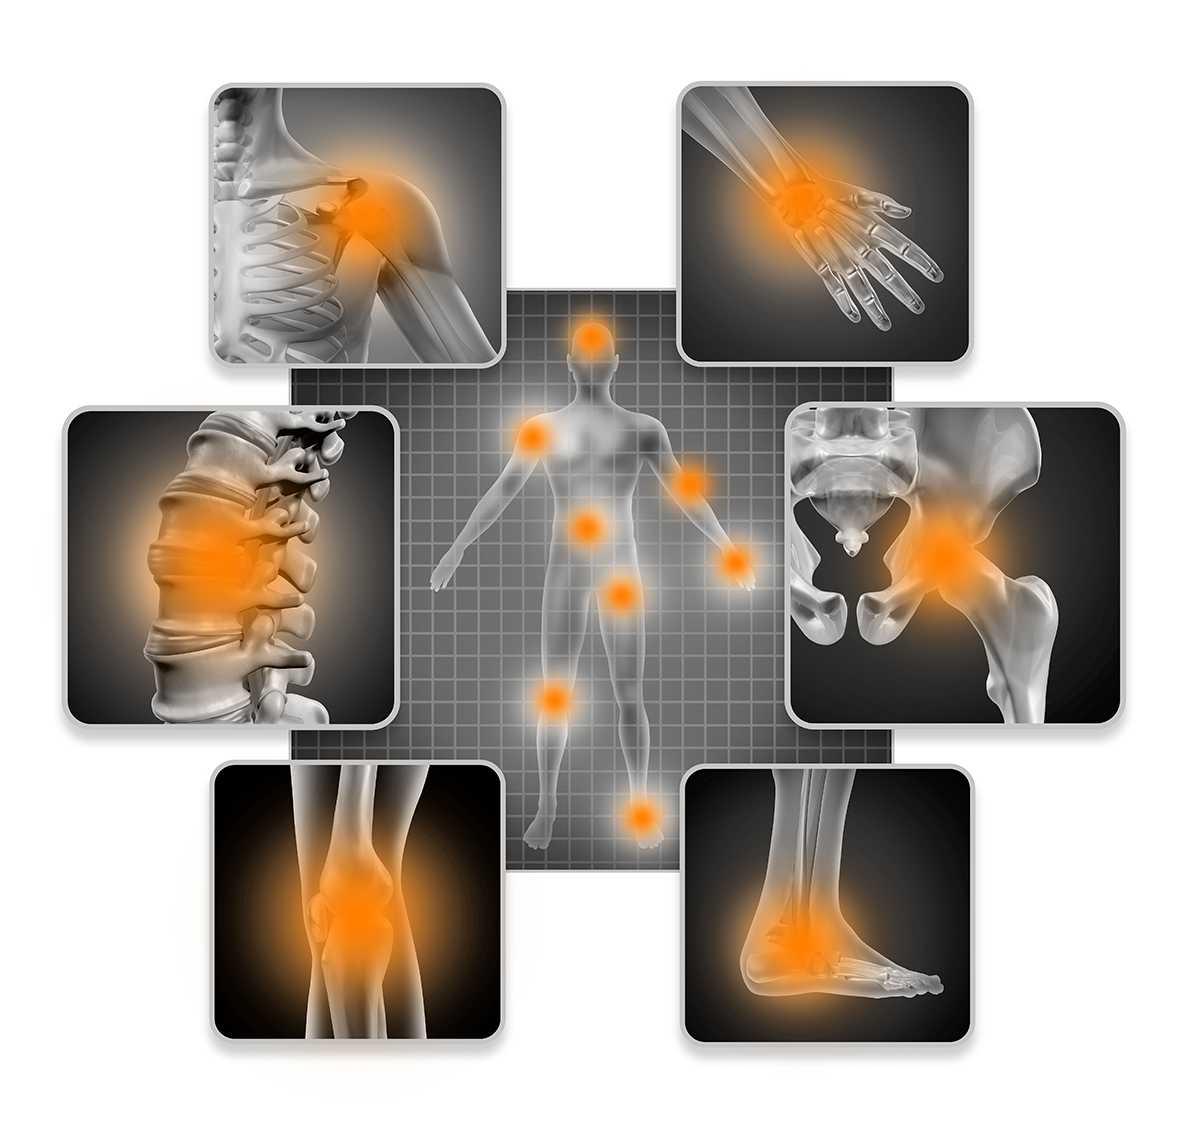 acupunctuur therapie bij pijn